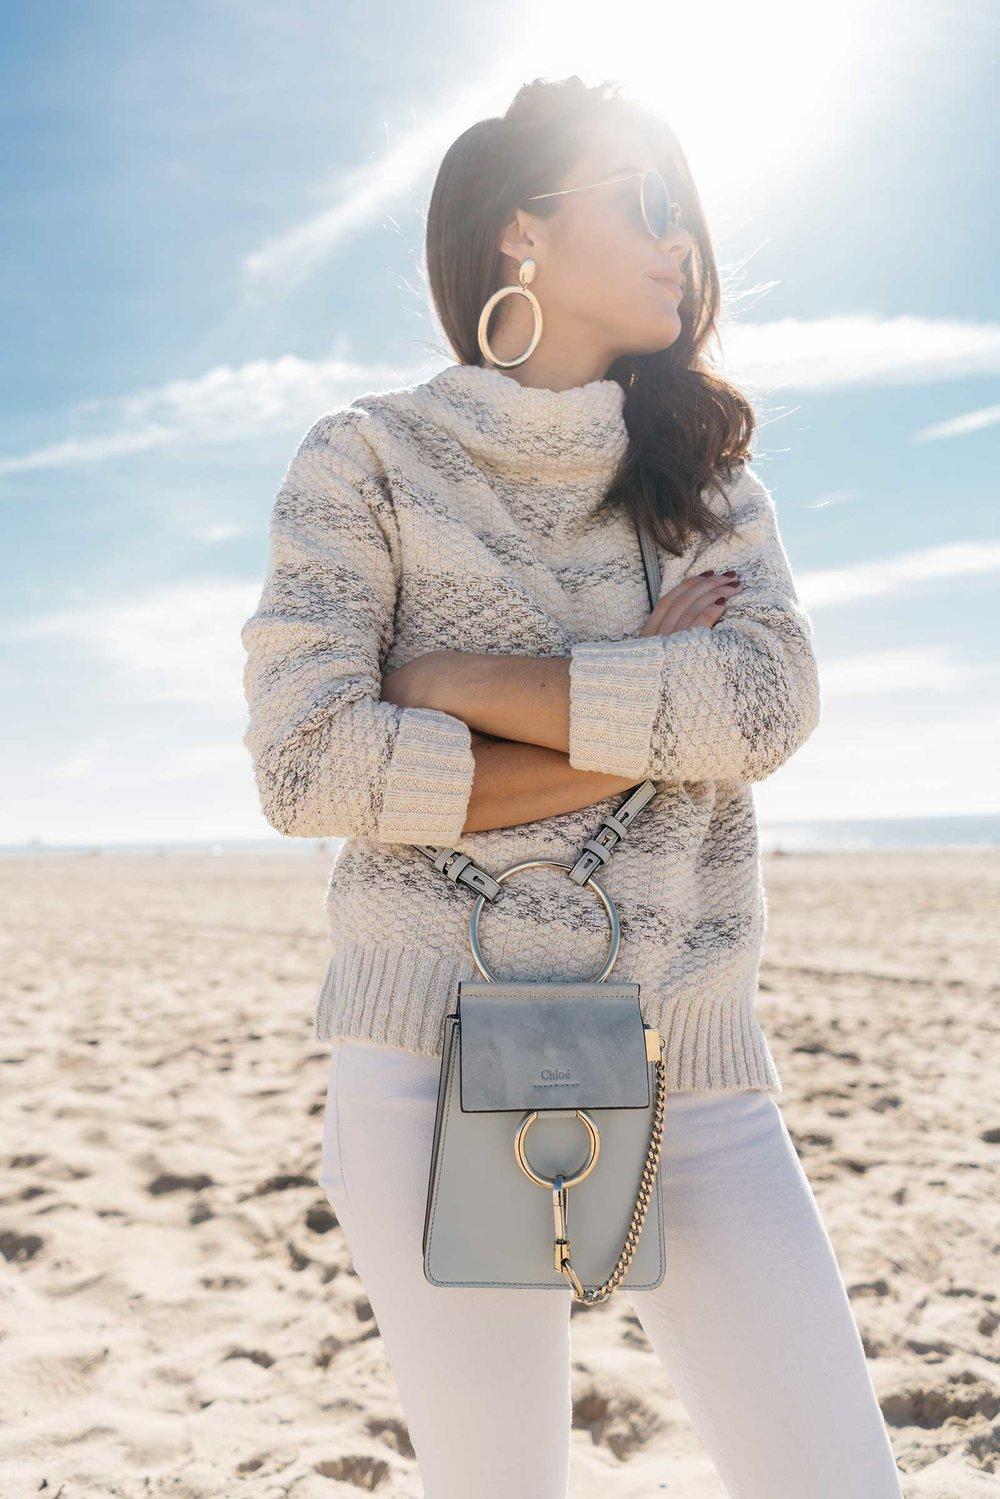 O'Neill-Livie-Striped-Mock-Neck-Sweater-Chloe-Faye-Small-Leather-Bracelet-Bag-Ray-Ban-53mm-Retro-Sunglasses-5.jpg